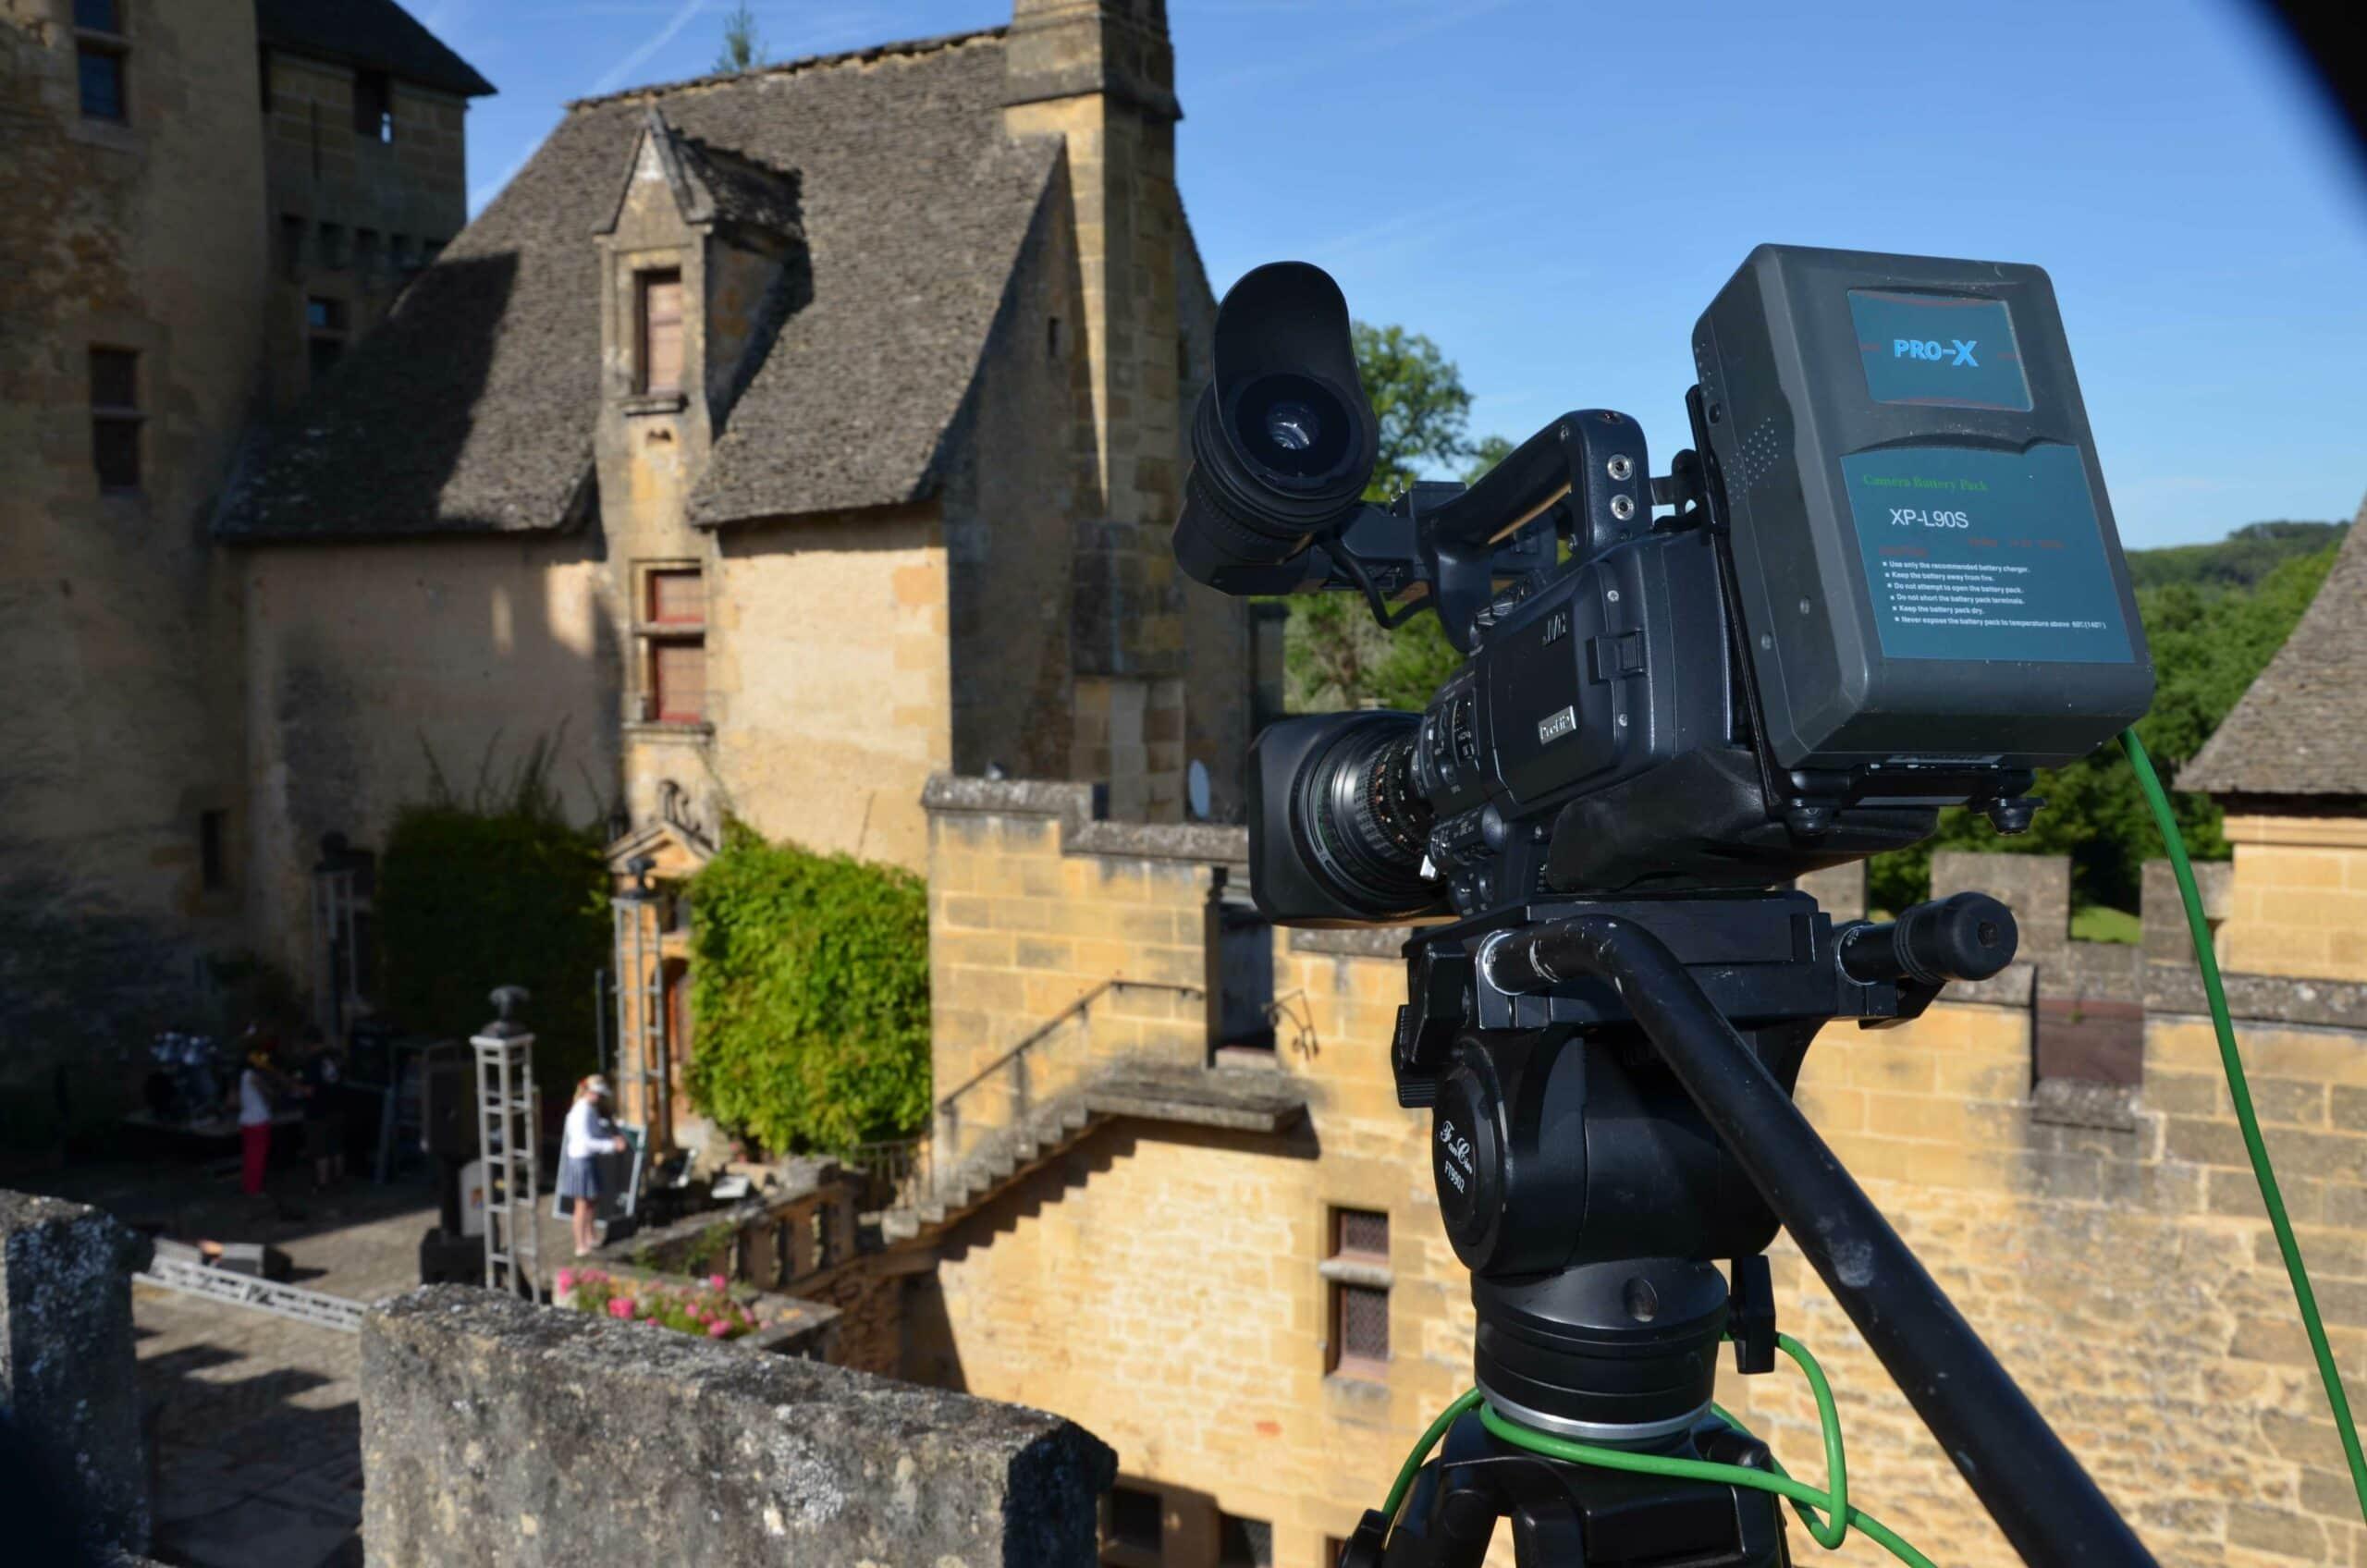 lieu de tournage château dordogne